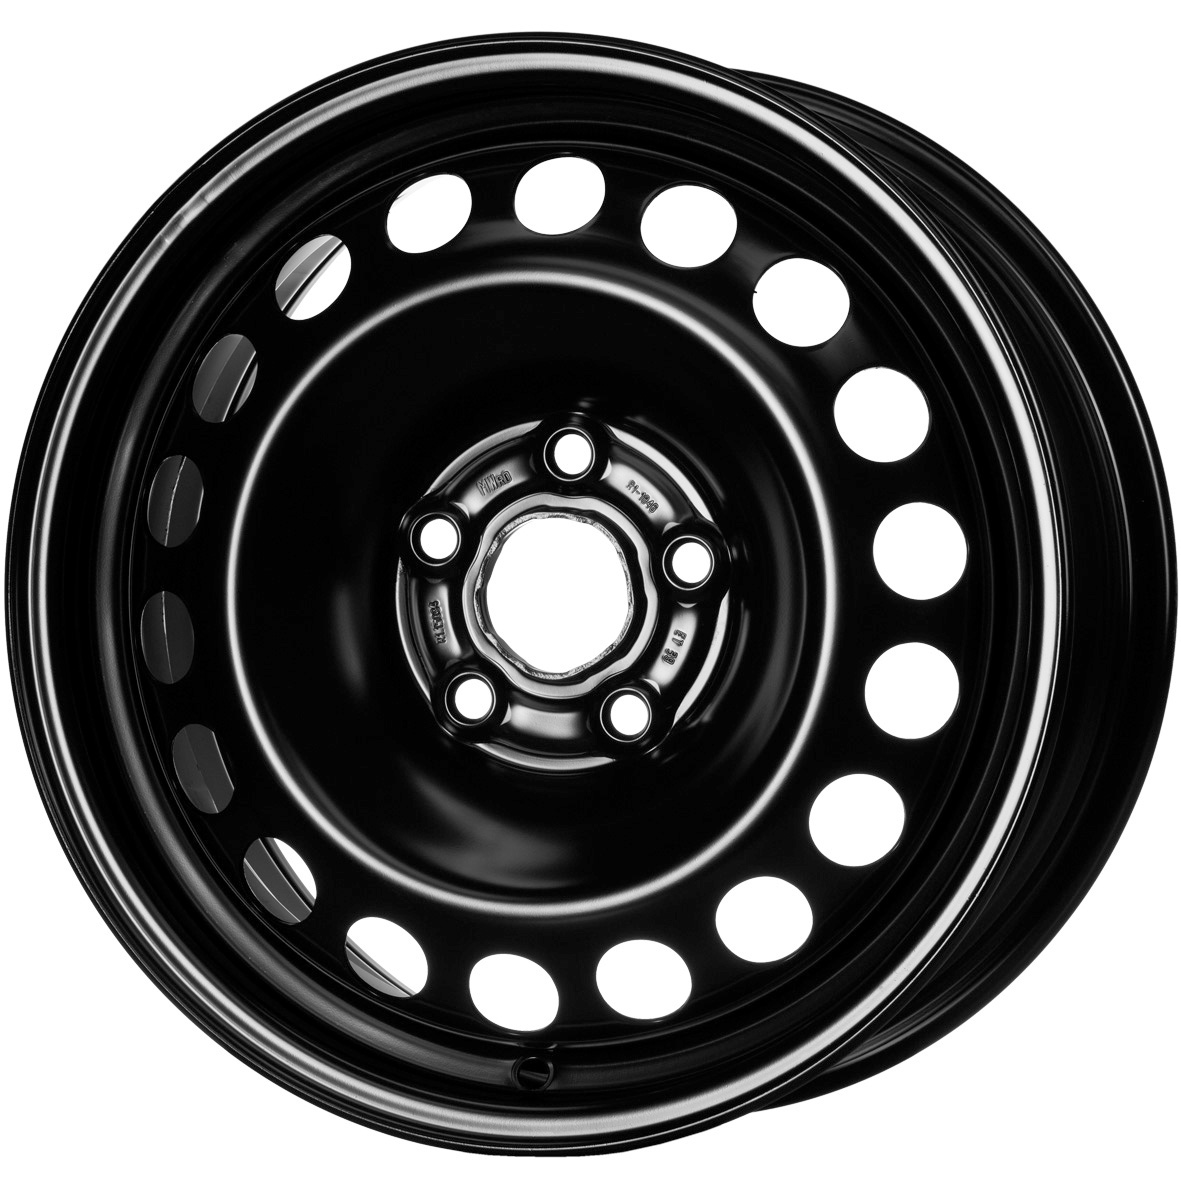 Vorschau: 15″ Stahlrad Sommer für Chevrolet Aveo 1.6 (KL1T) Kumho VS31 195/65 R15 91H